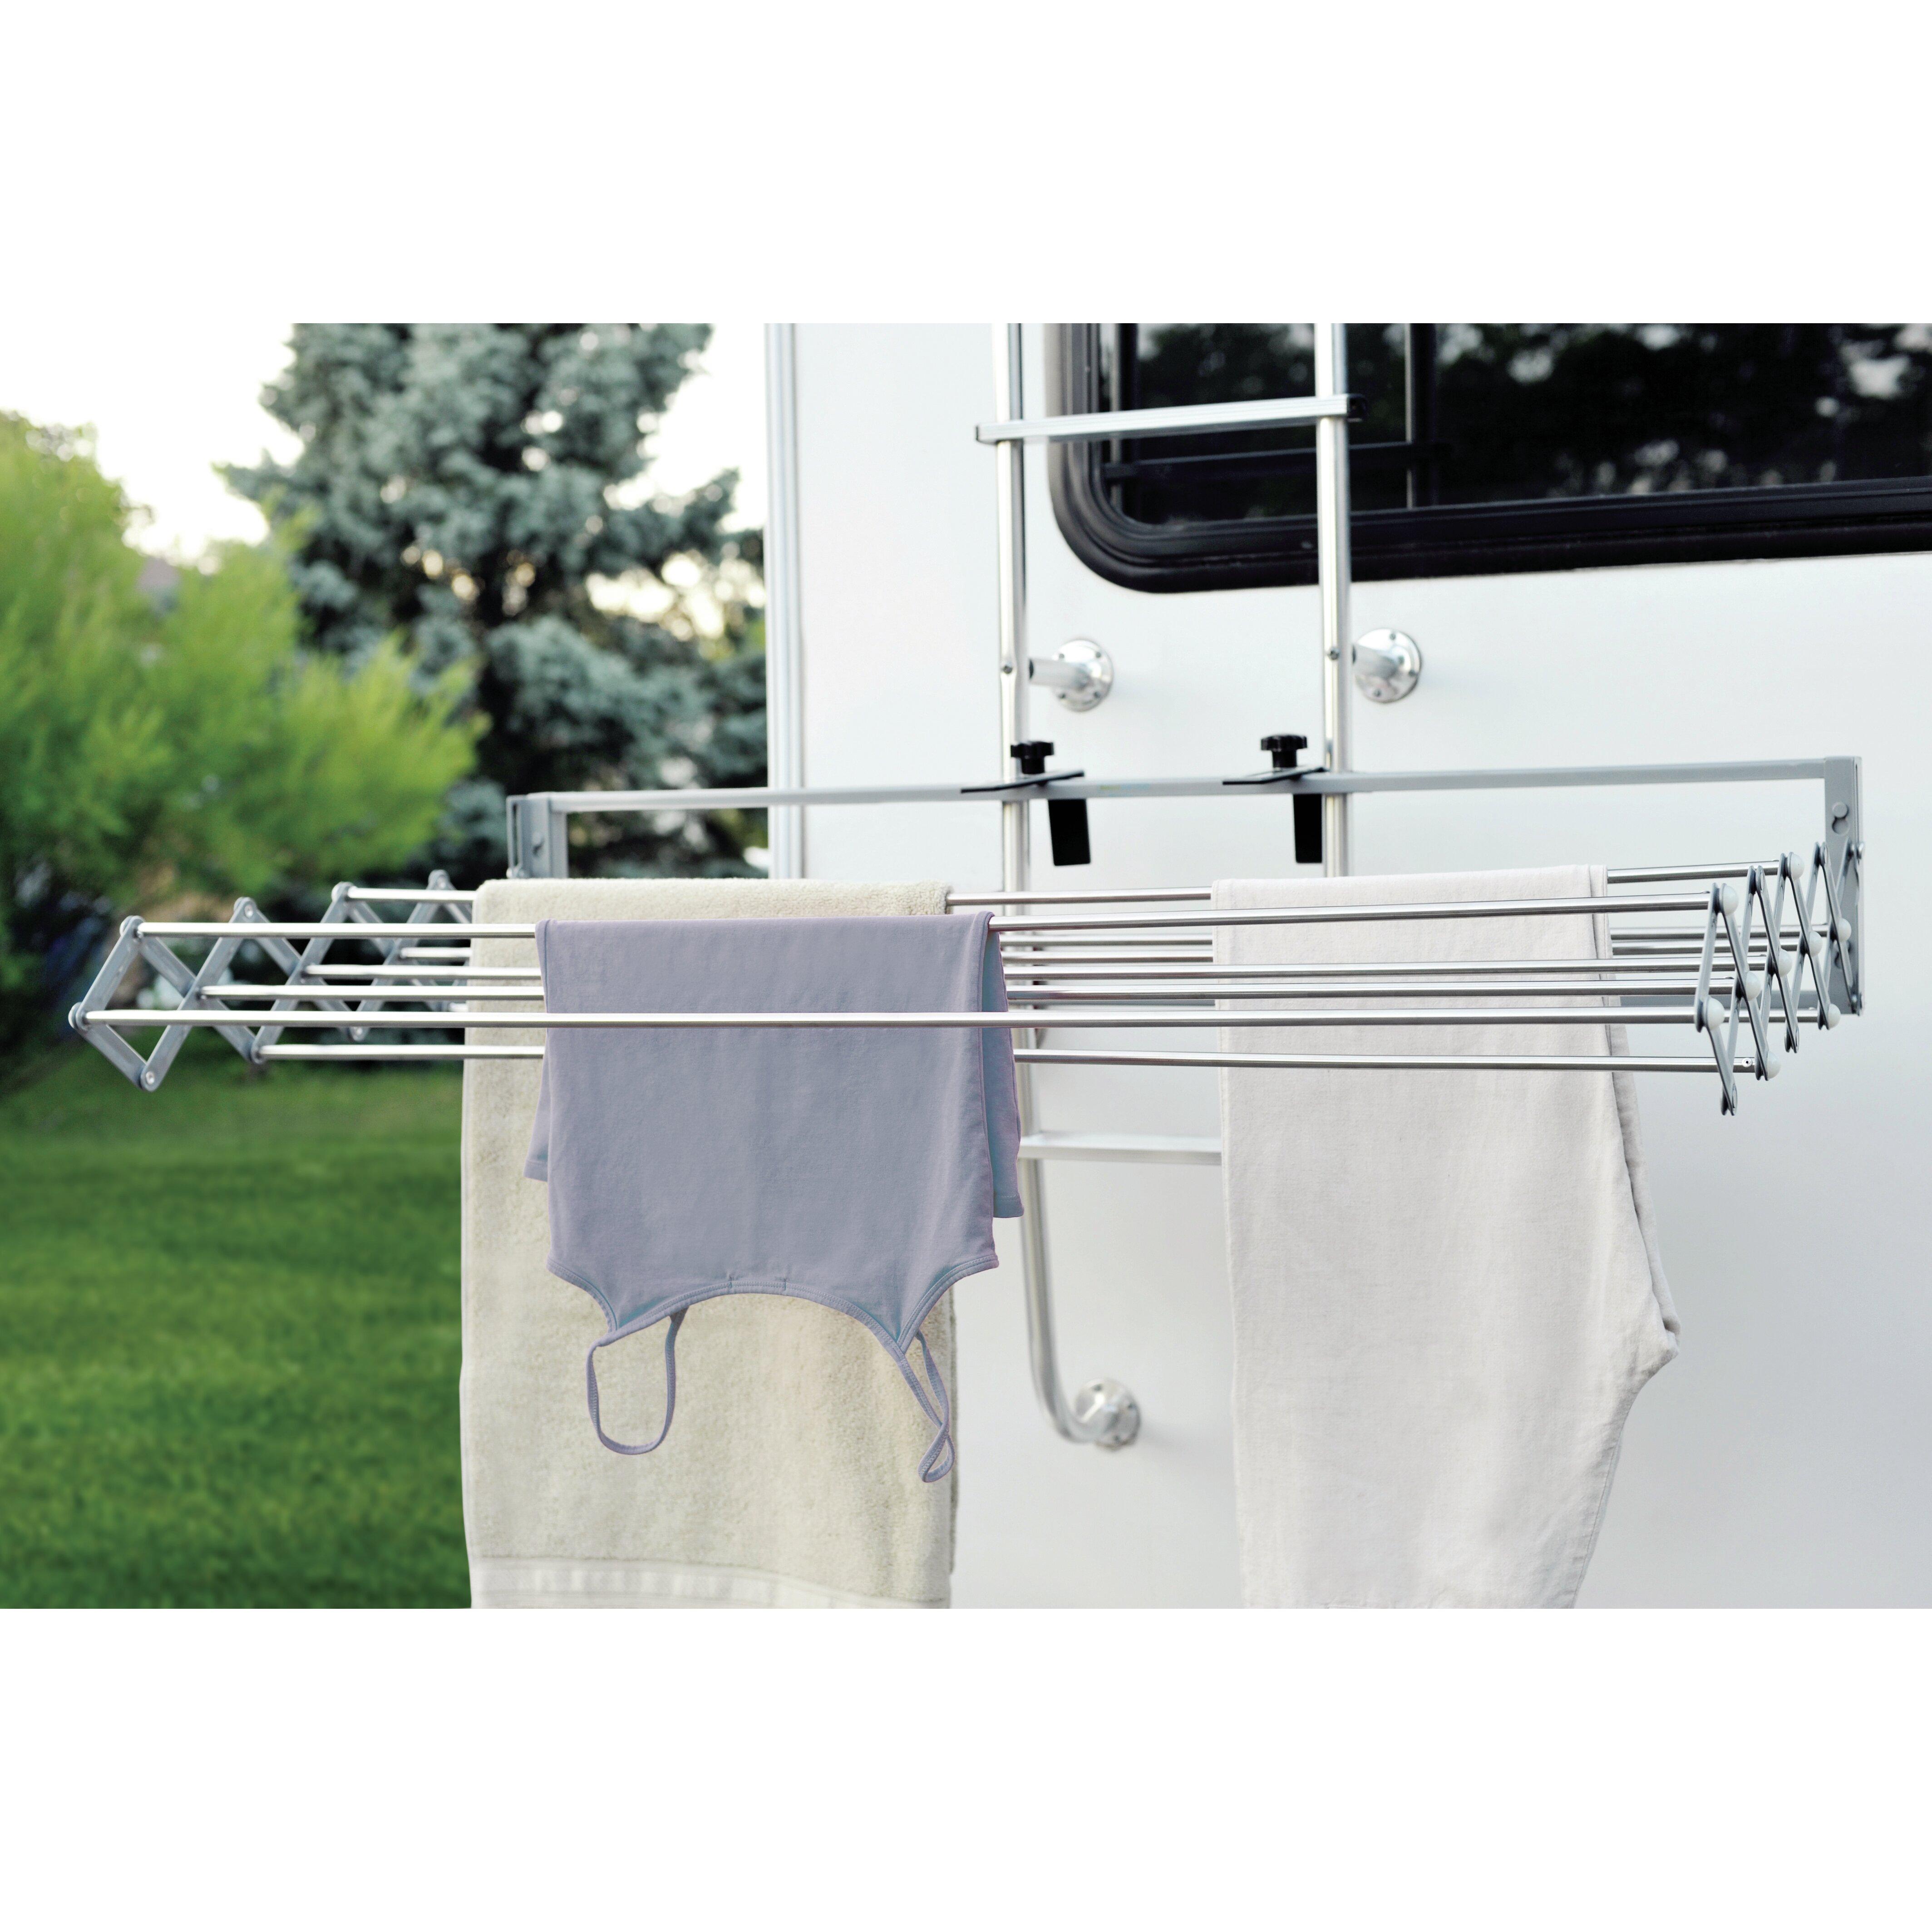 Xcentrik smart dryer telescopic clothes drying rack reviews wayfair - Seche linge extensible mural ...